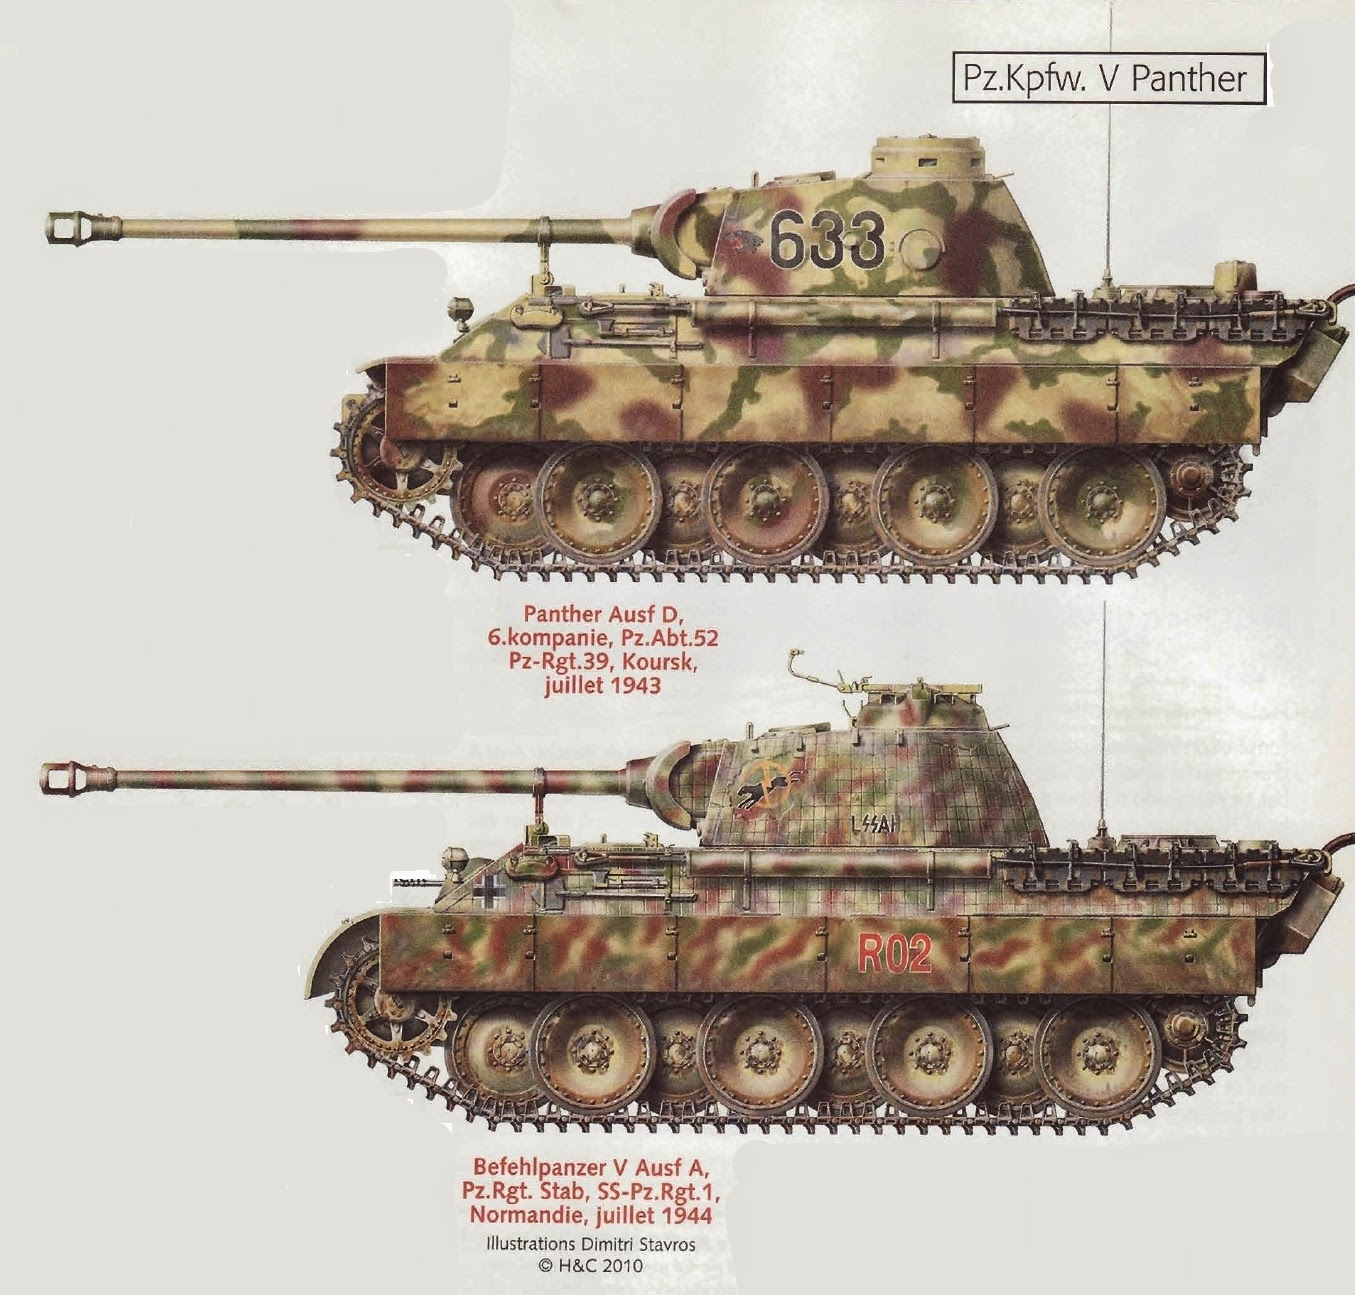 Panther D에 대한 이미지 검색결과